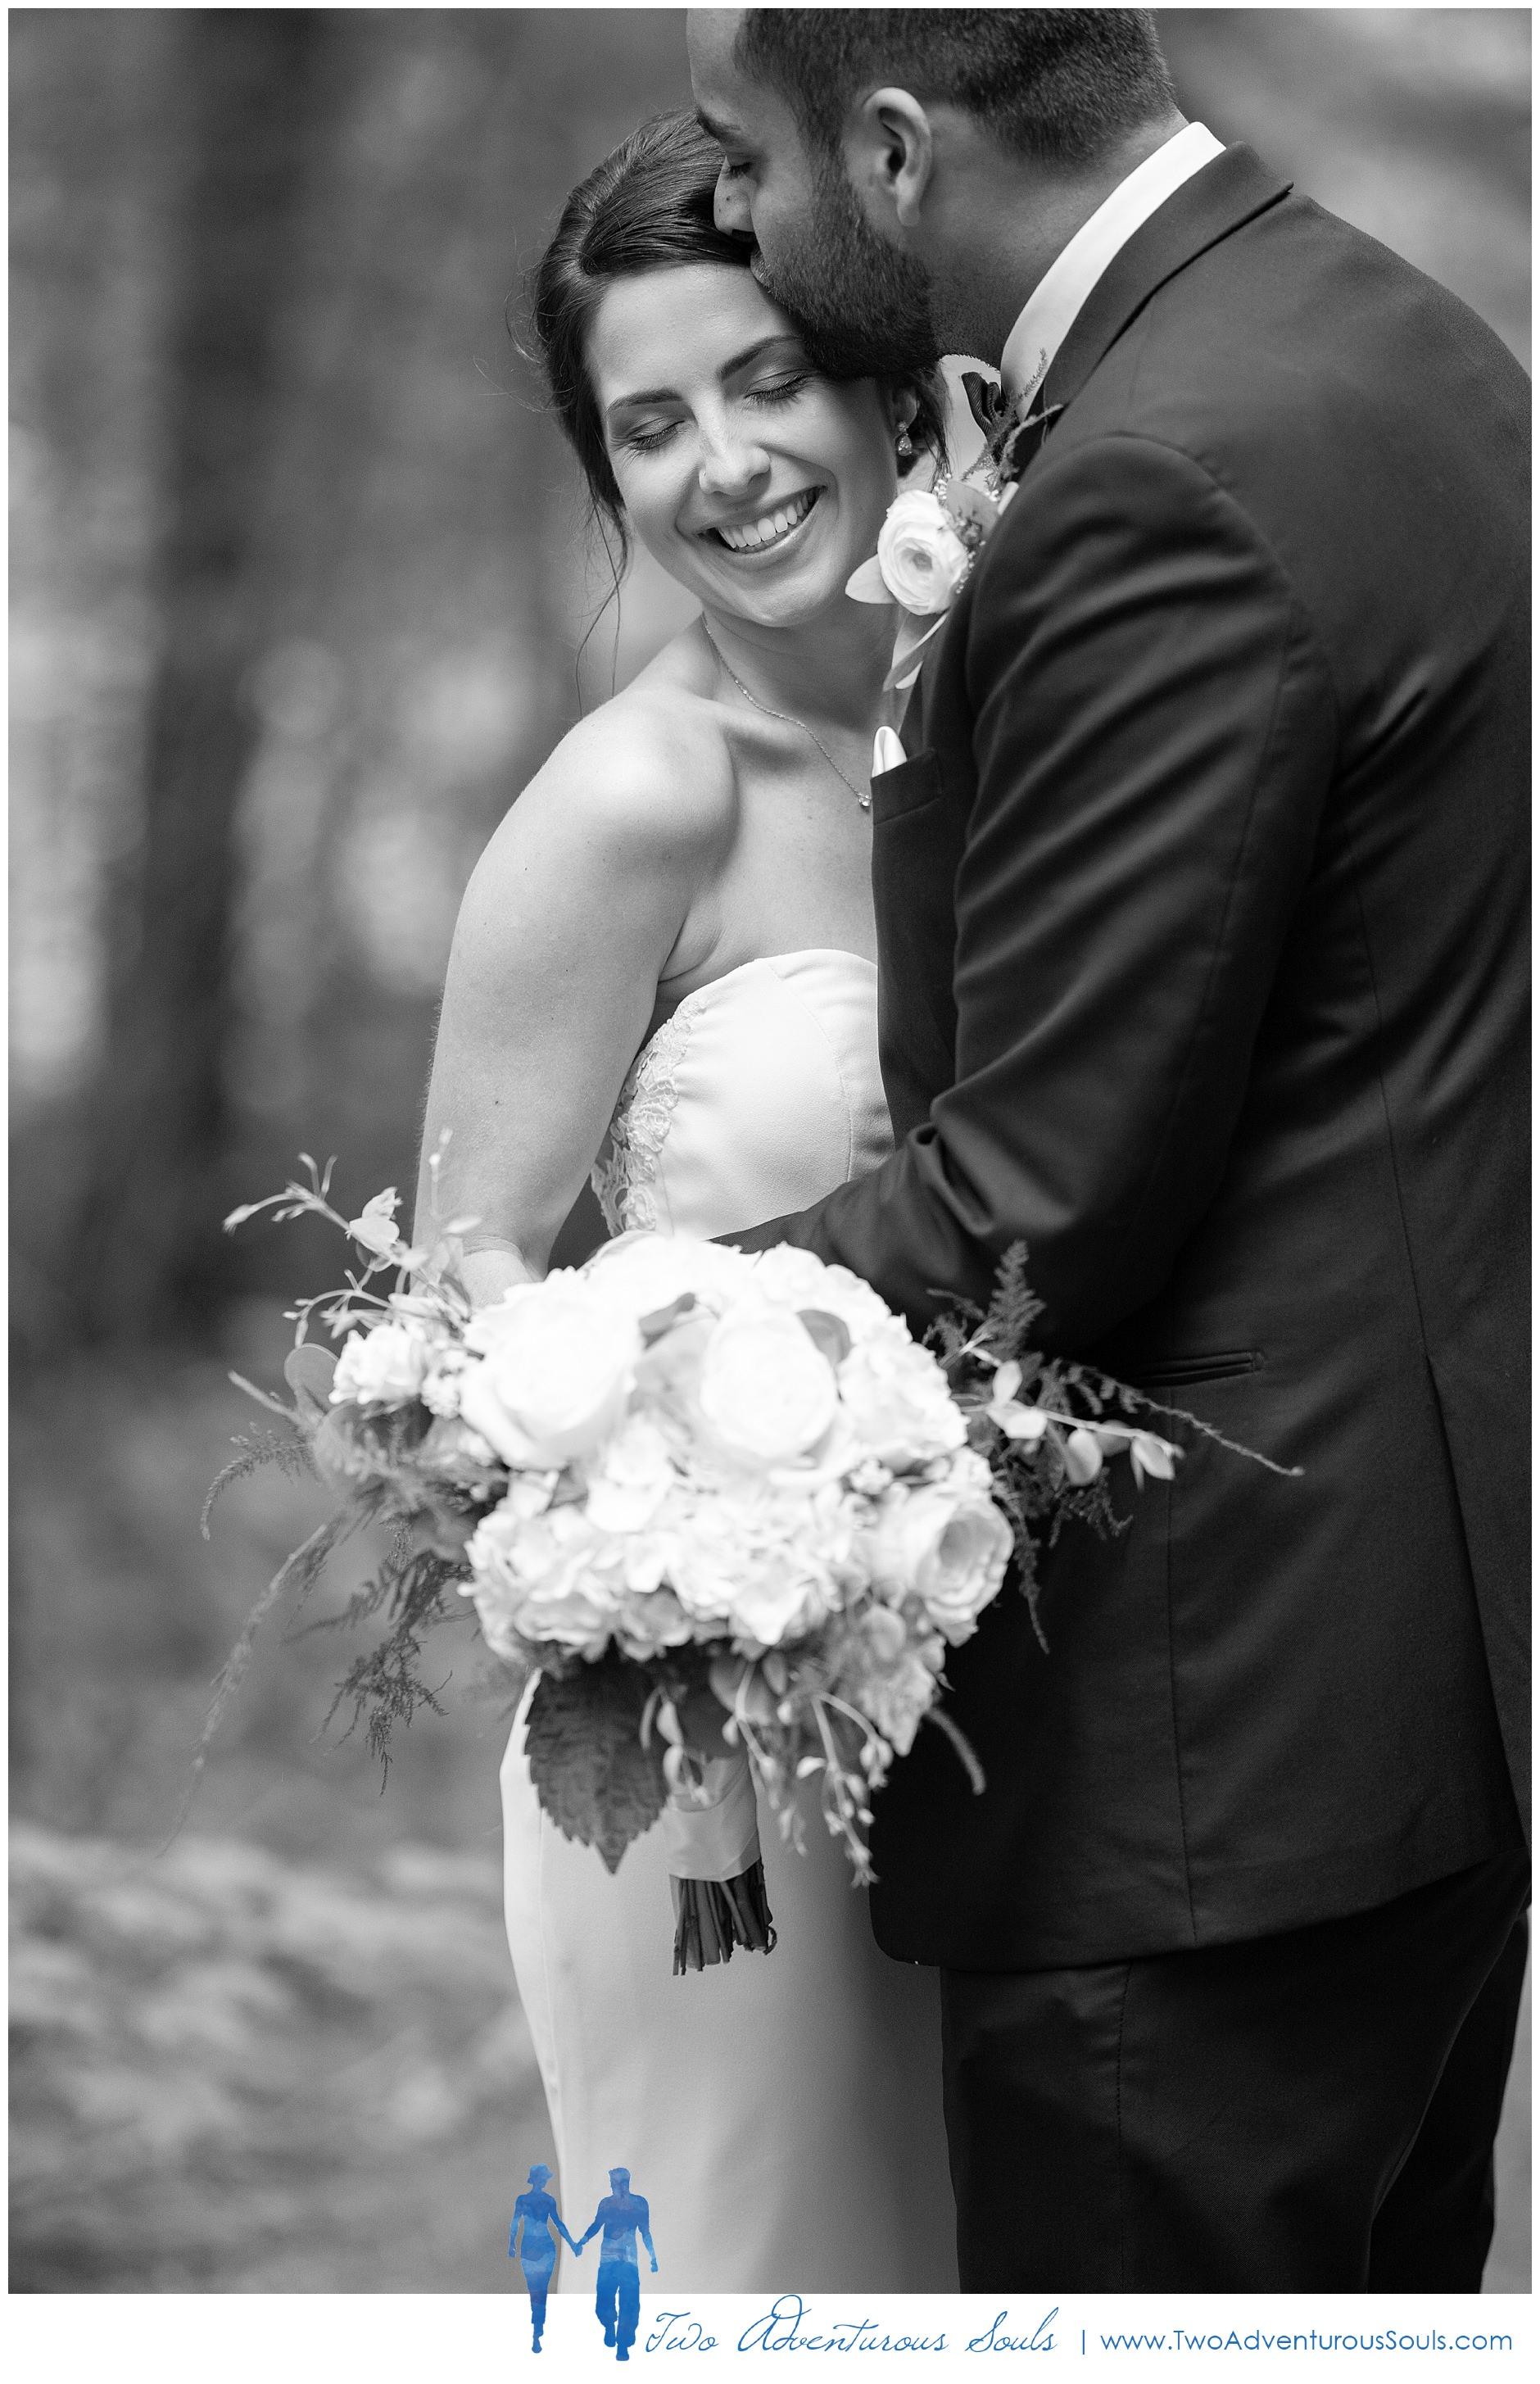 Sugarloaf Outdoor Center Wedding Photographers, Destination Wedding Photographers, Two Adventurous Souls-081719_0050.jpg